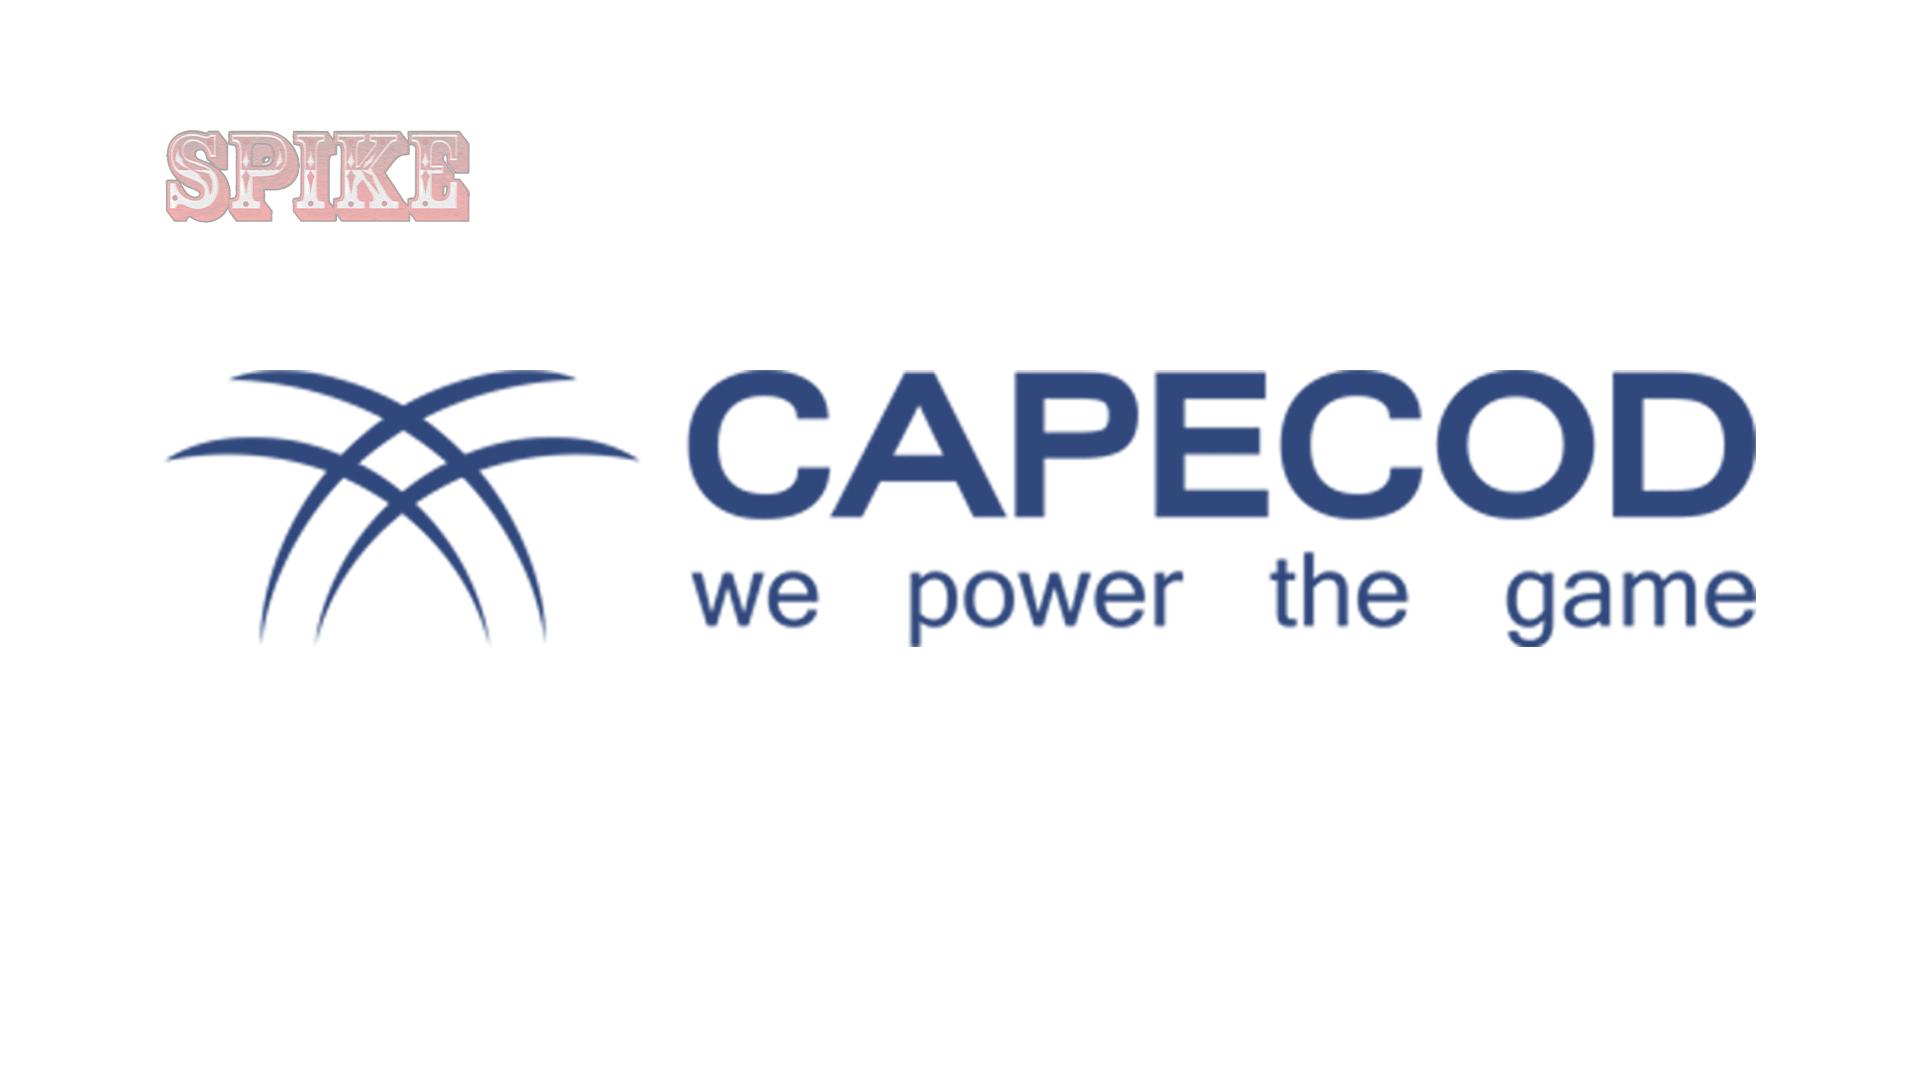 capecod italian producer slot online free demo